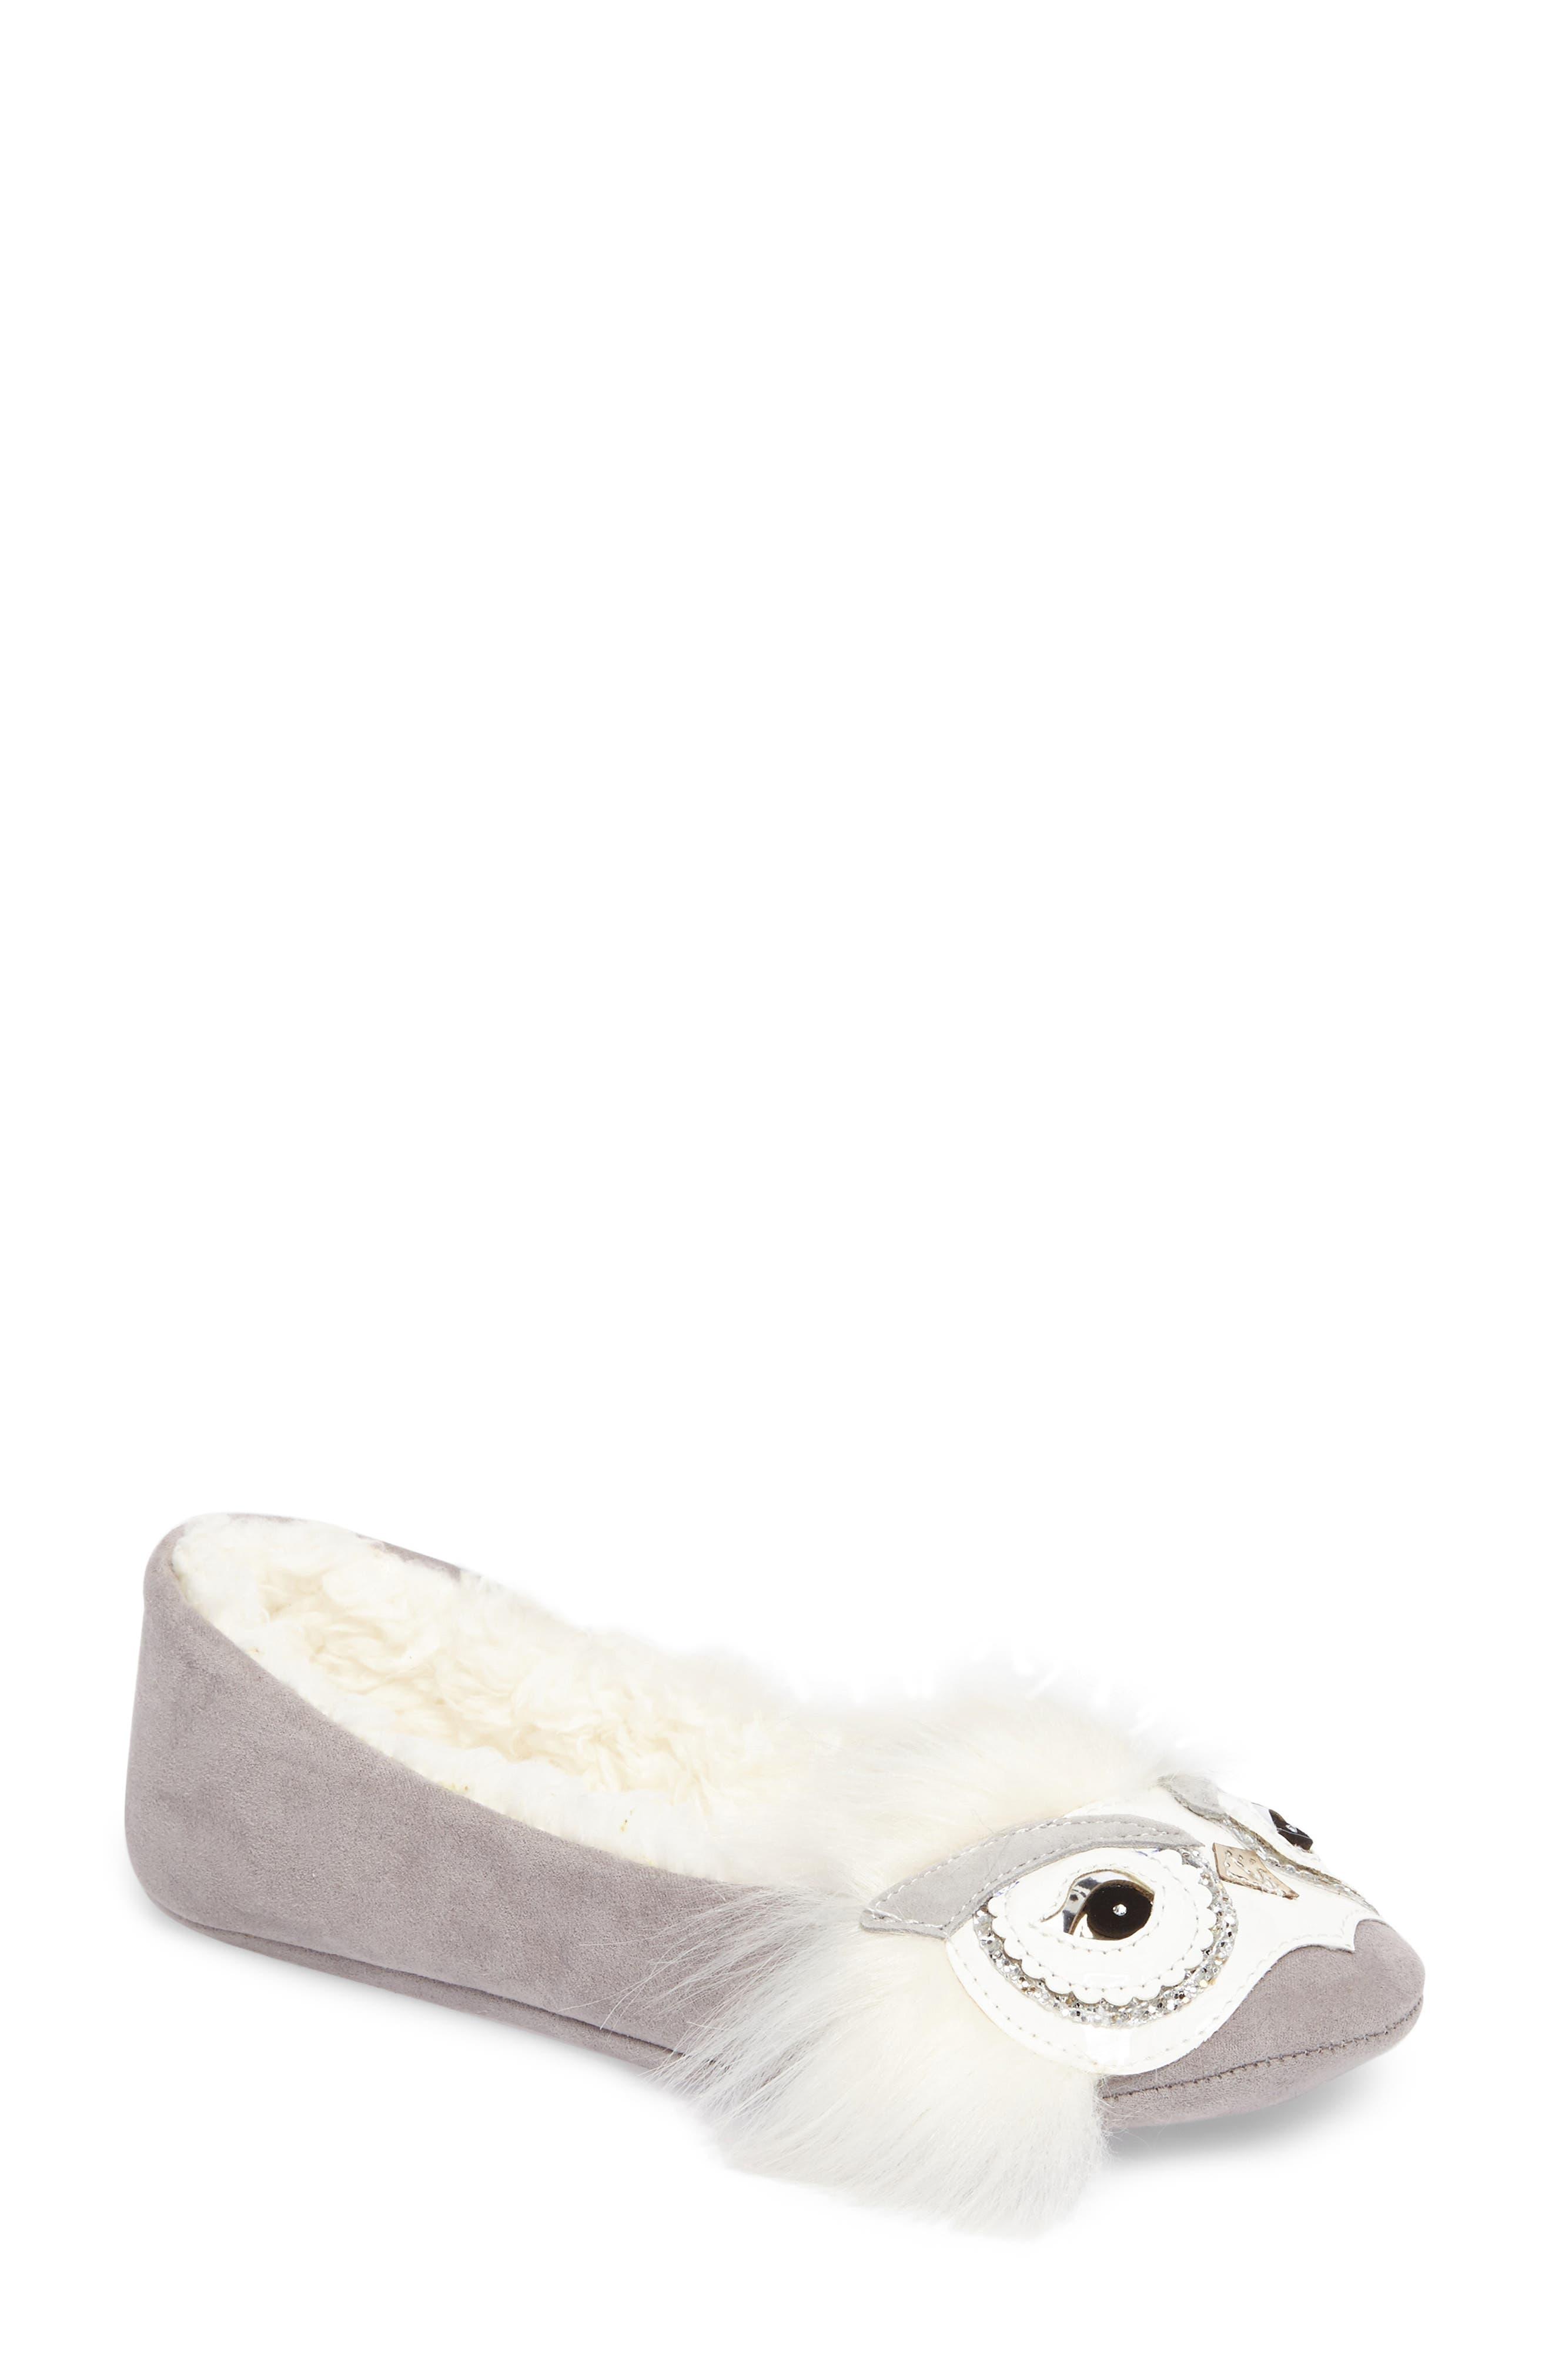 samantha owl slipper,                             Main thumbnail 1, color,                             021